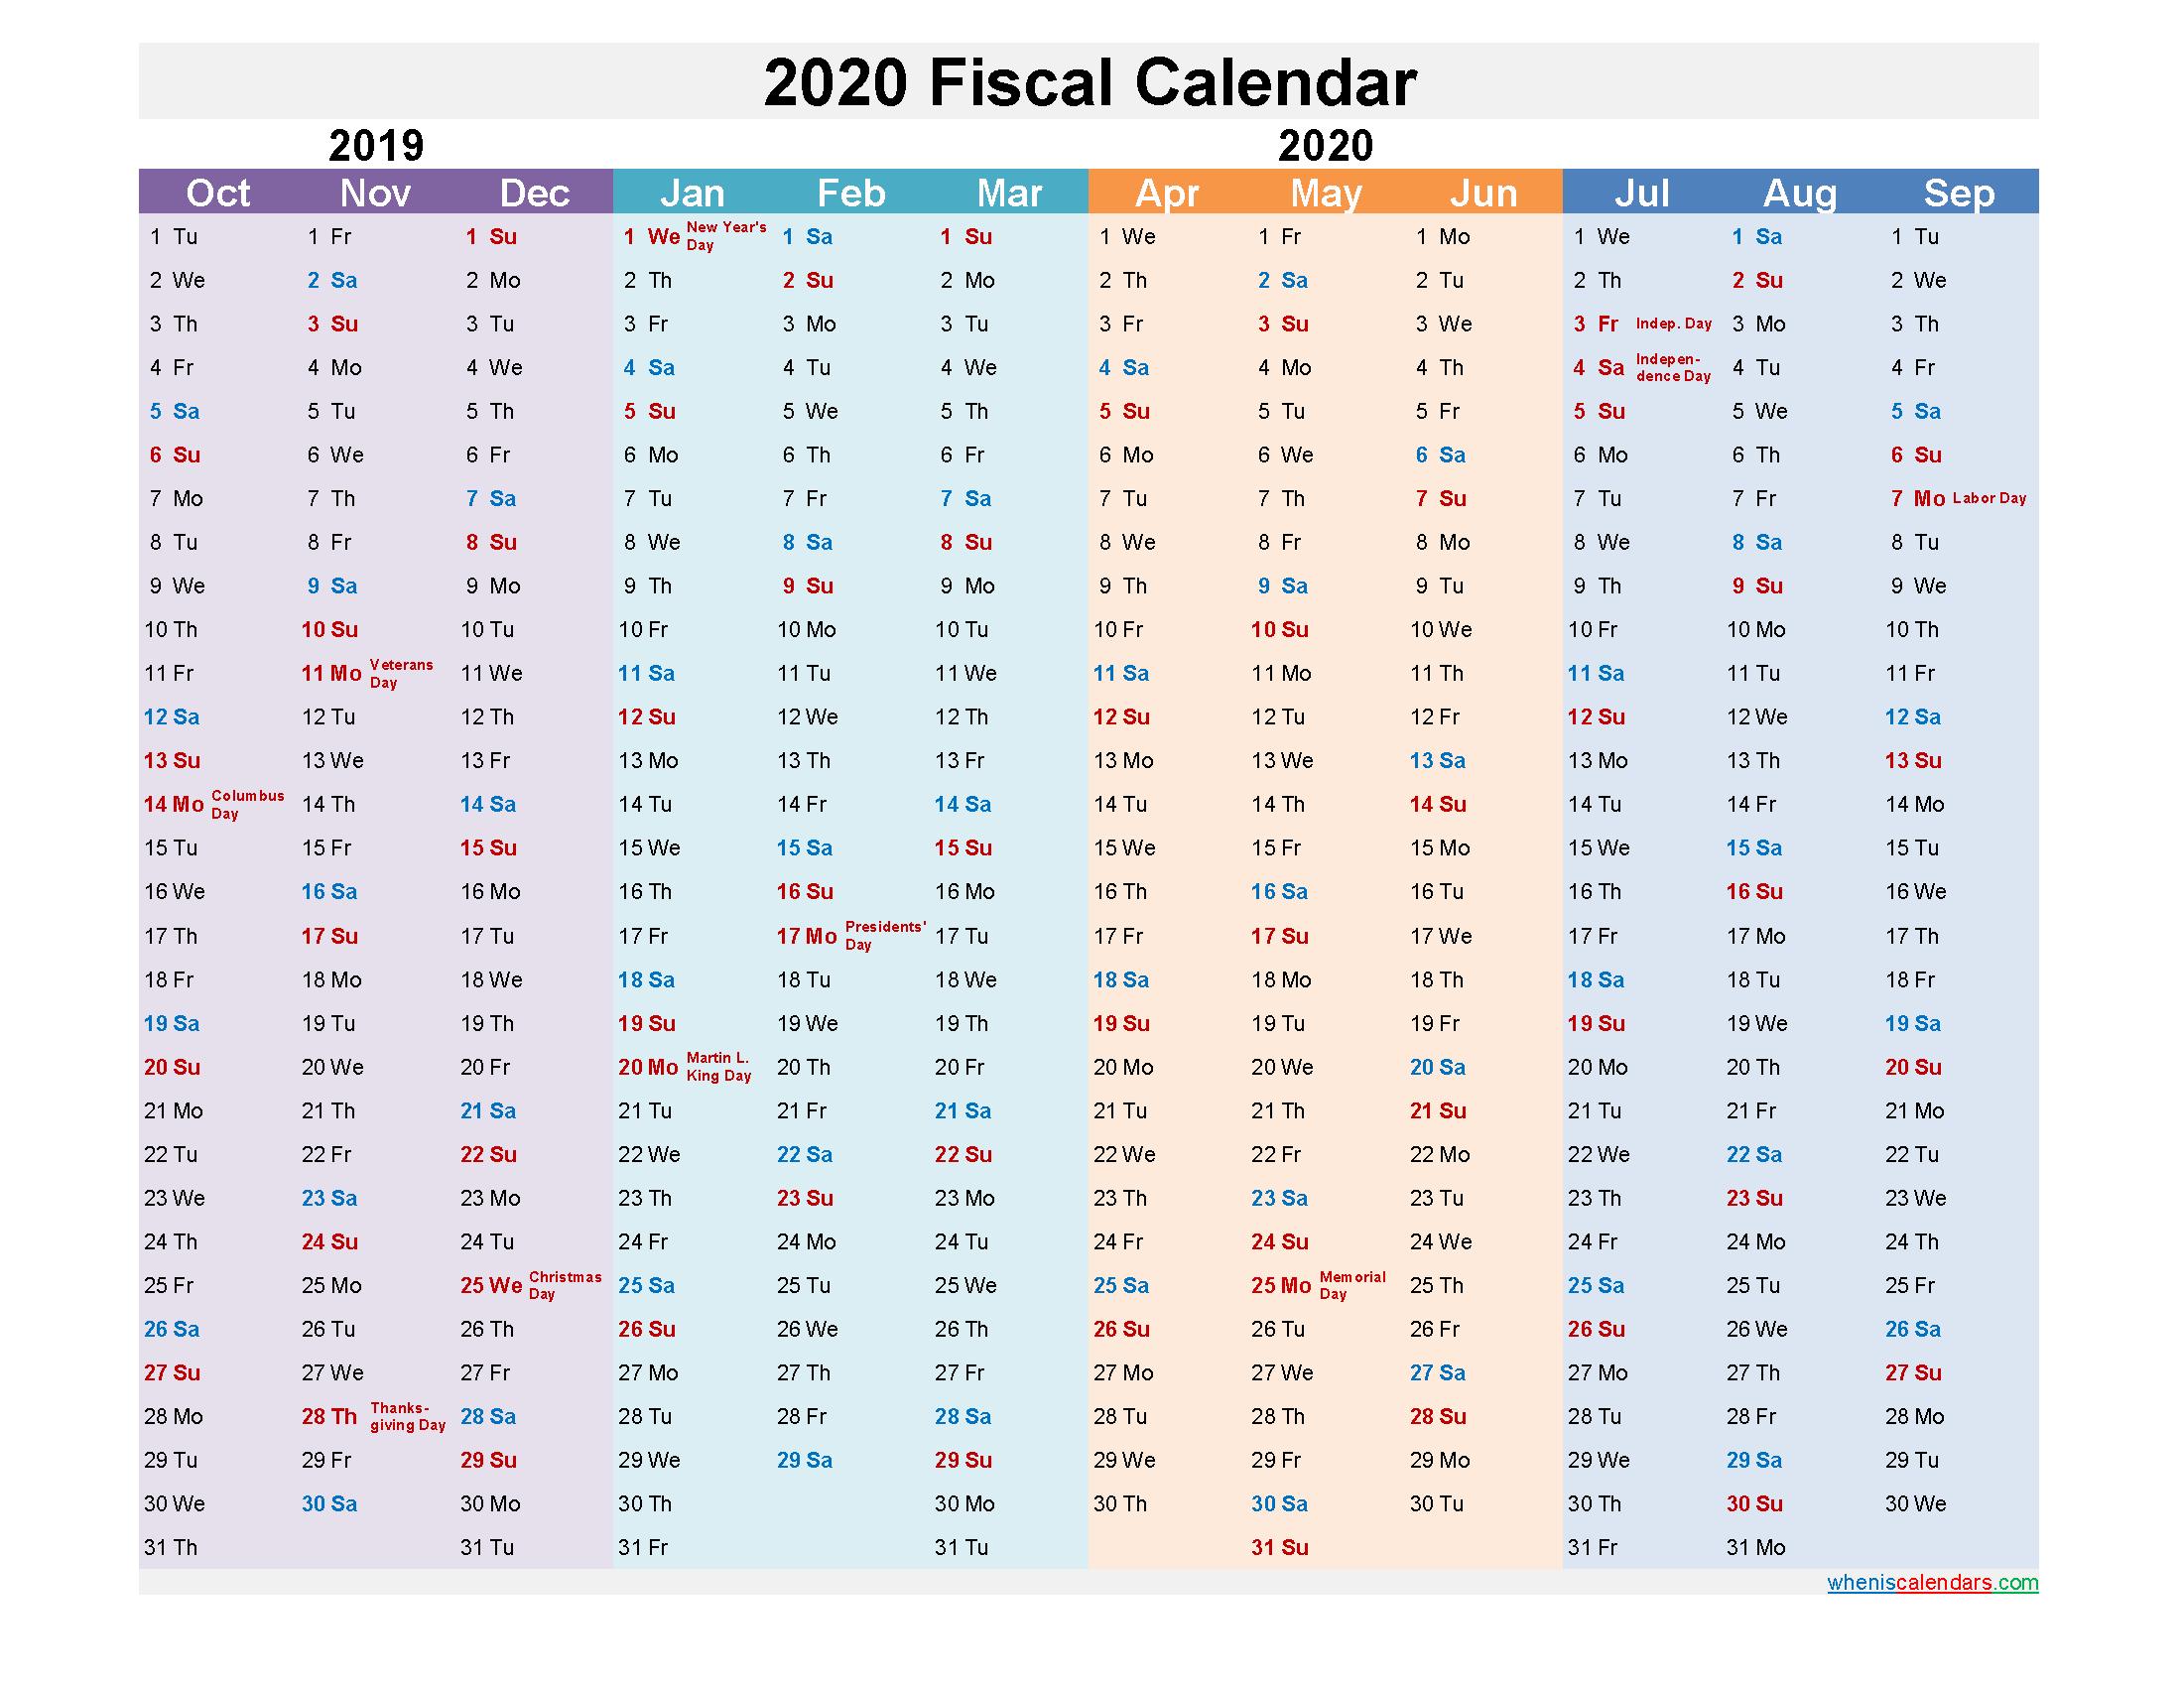 Fiscal Year Calendar 2020